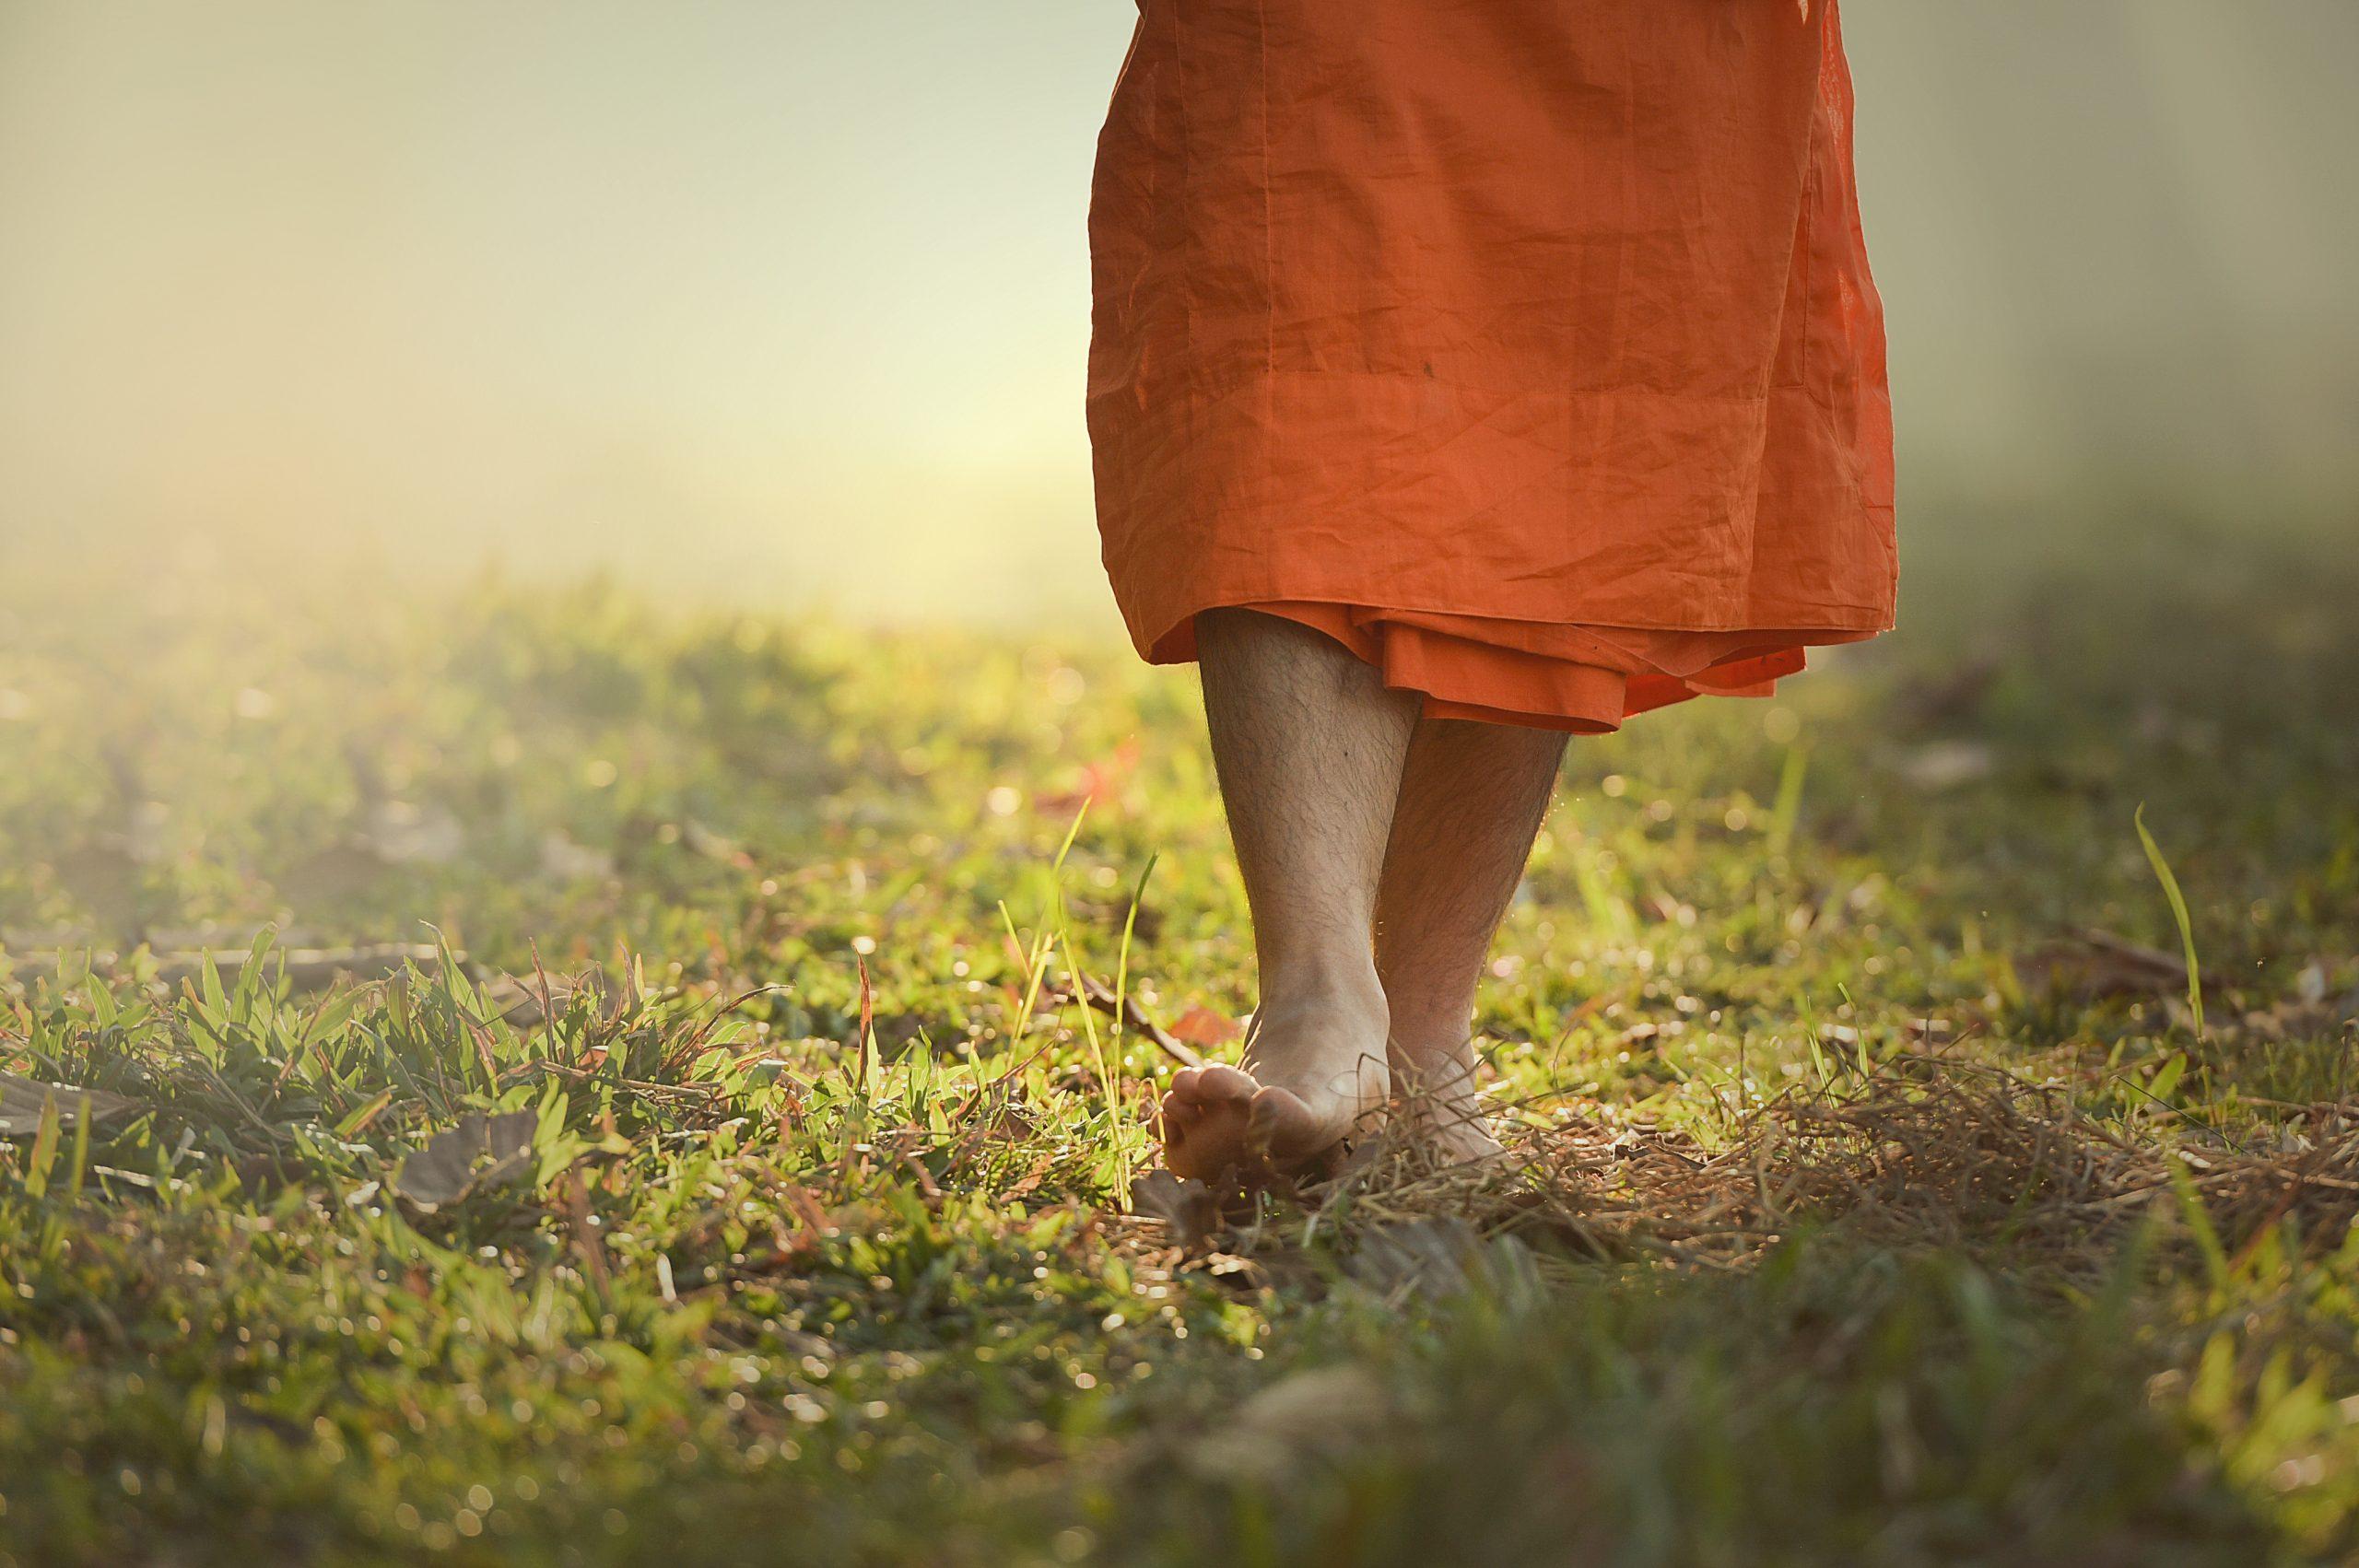 Buddhist monks walk on the grass